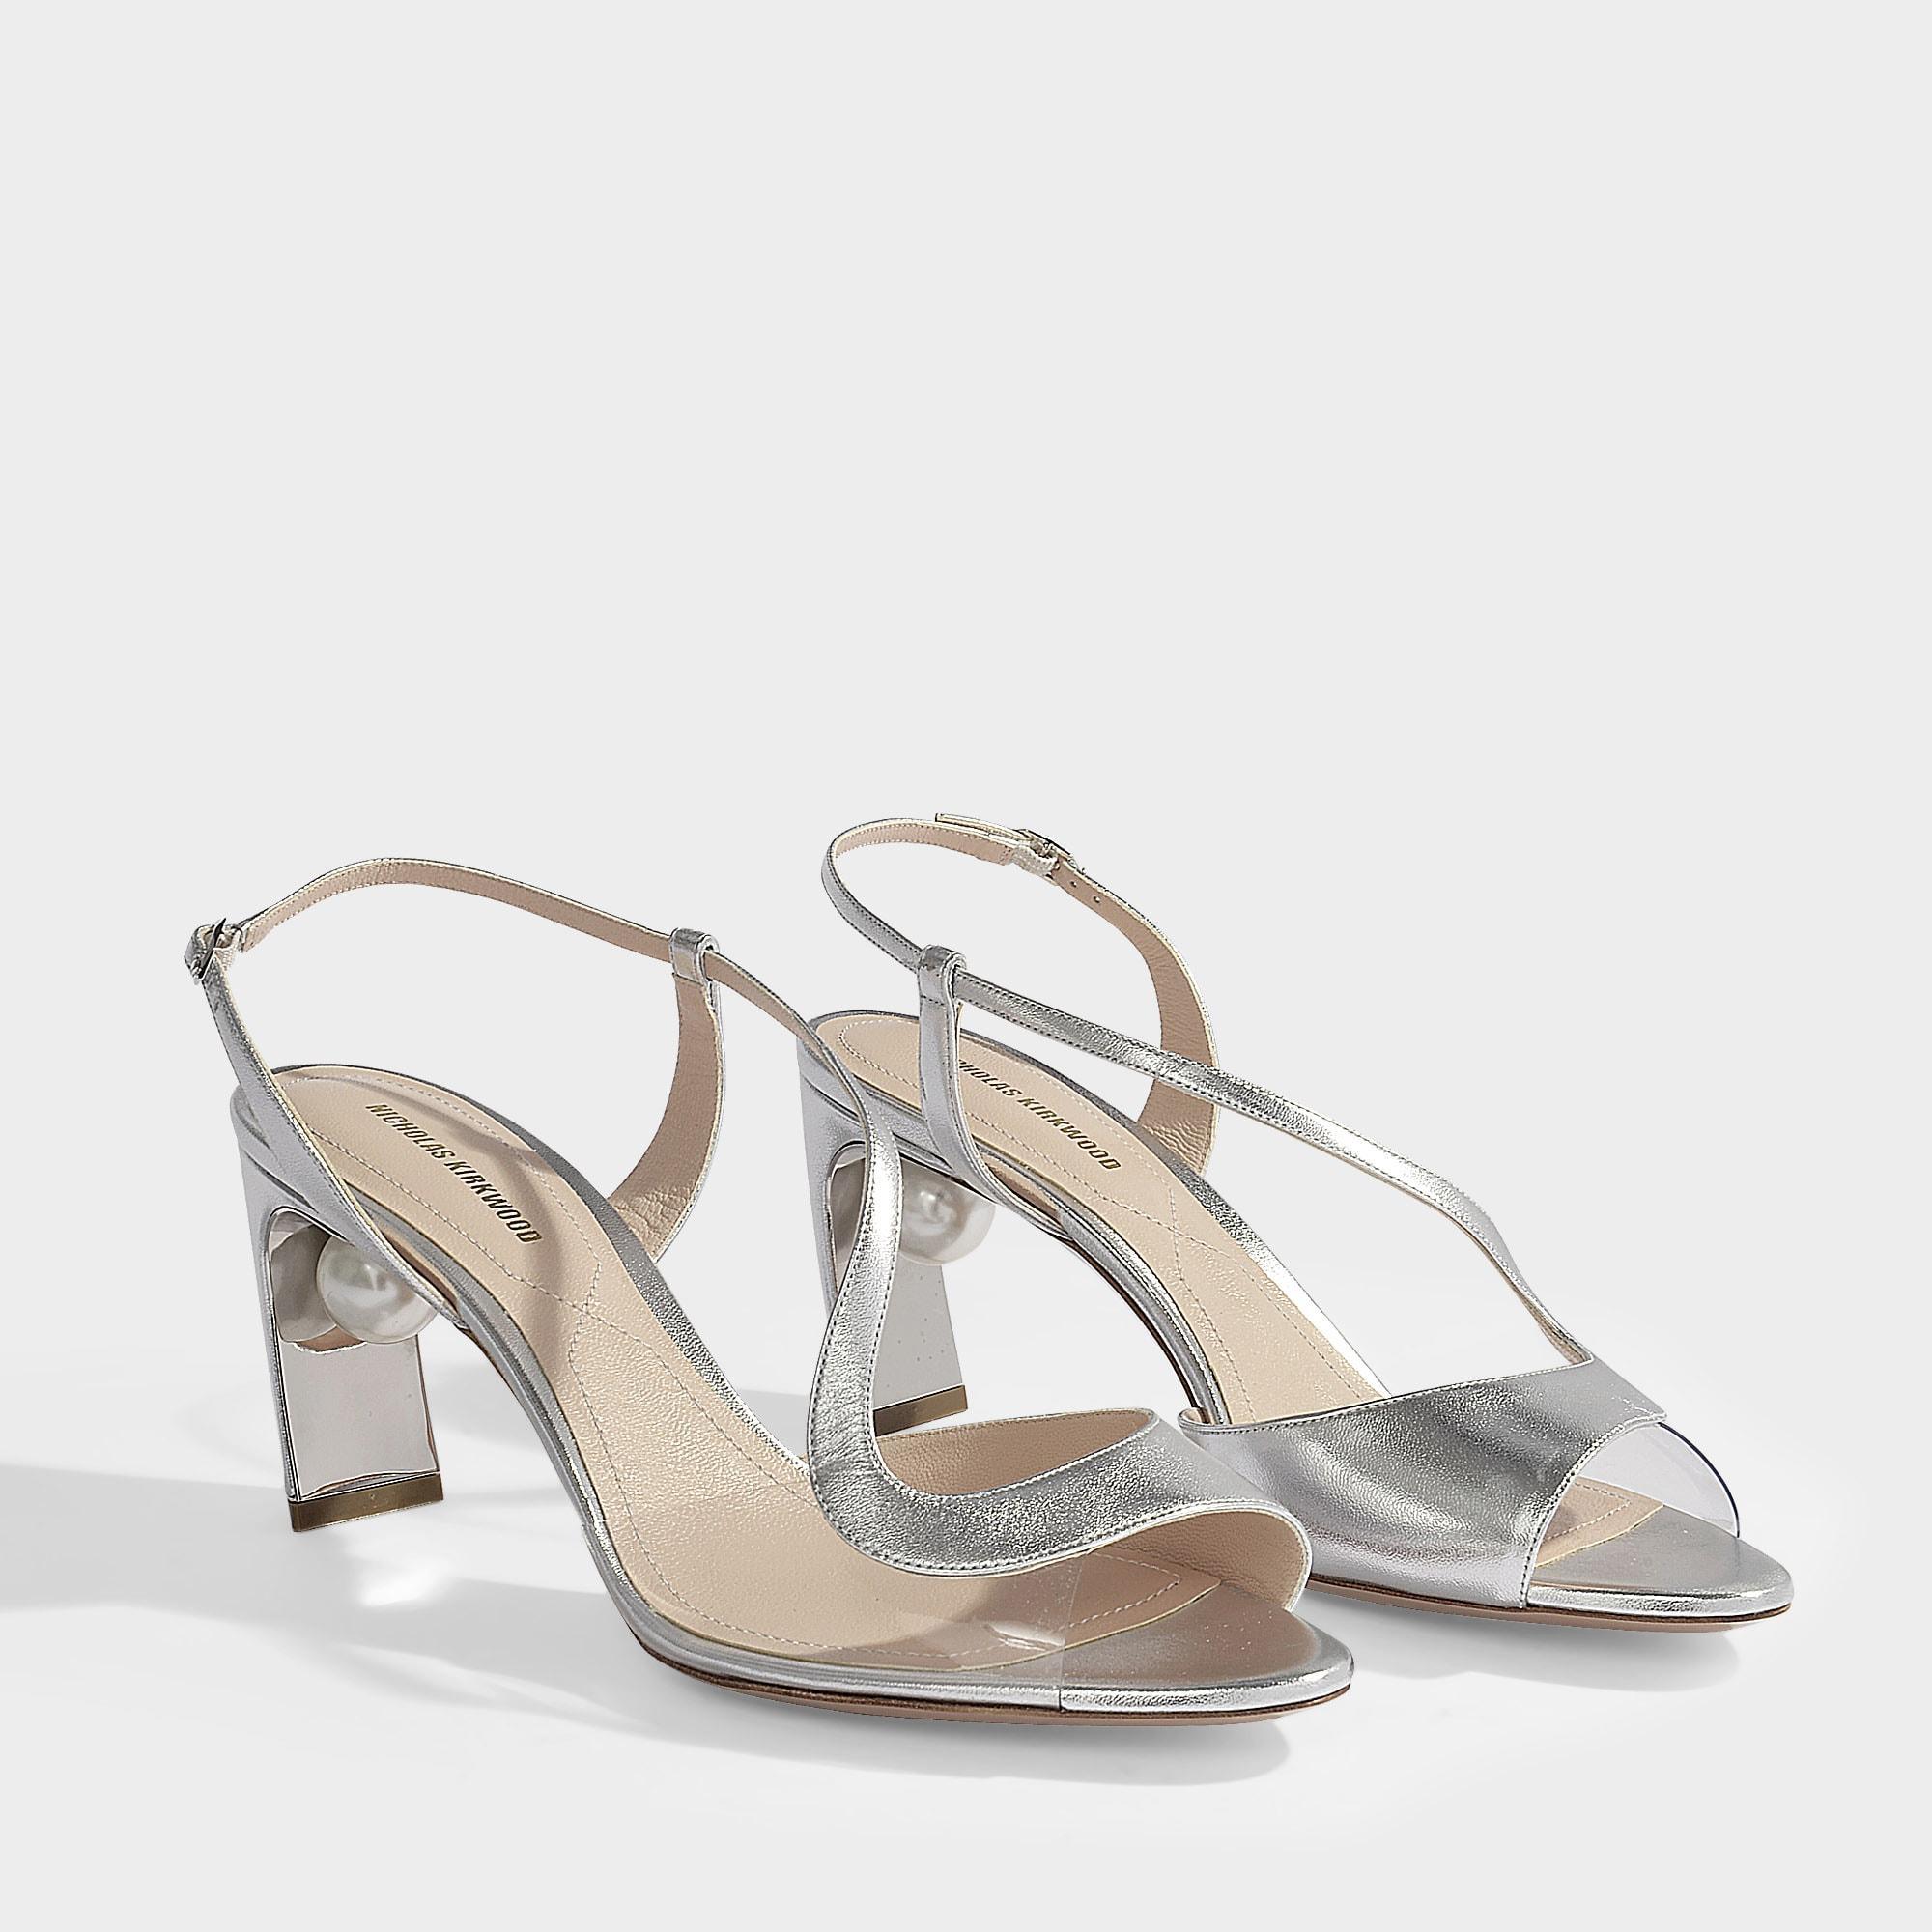 4ff3bf2537d2 Nicholas Kirkwood - Multicolor 70mm Maeva Pearl S Sandals In Silver  Metallic Nappa Leather - Lyst. View fullscreen